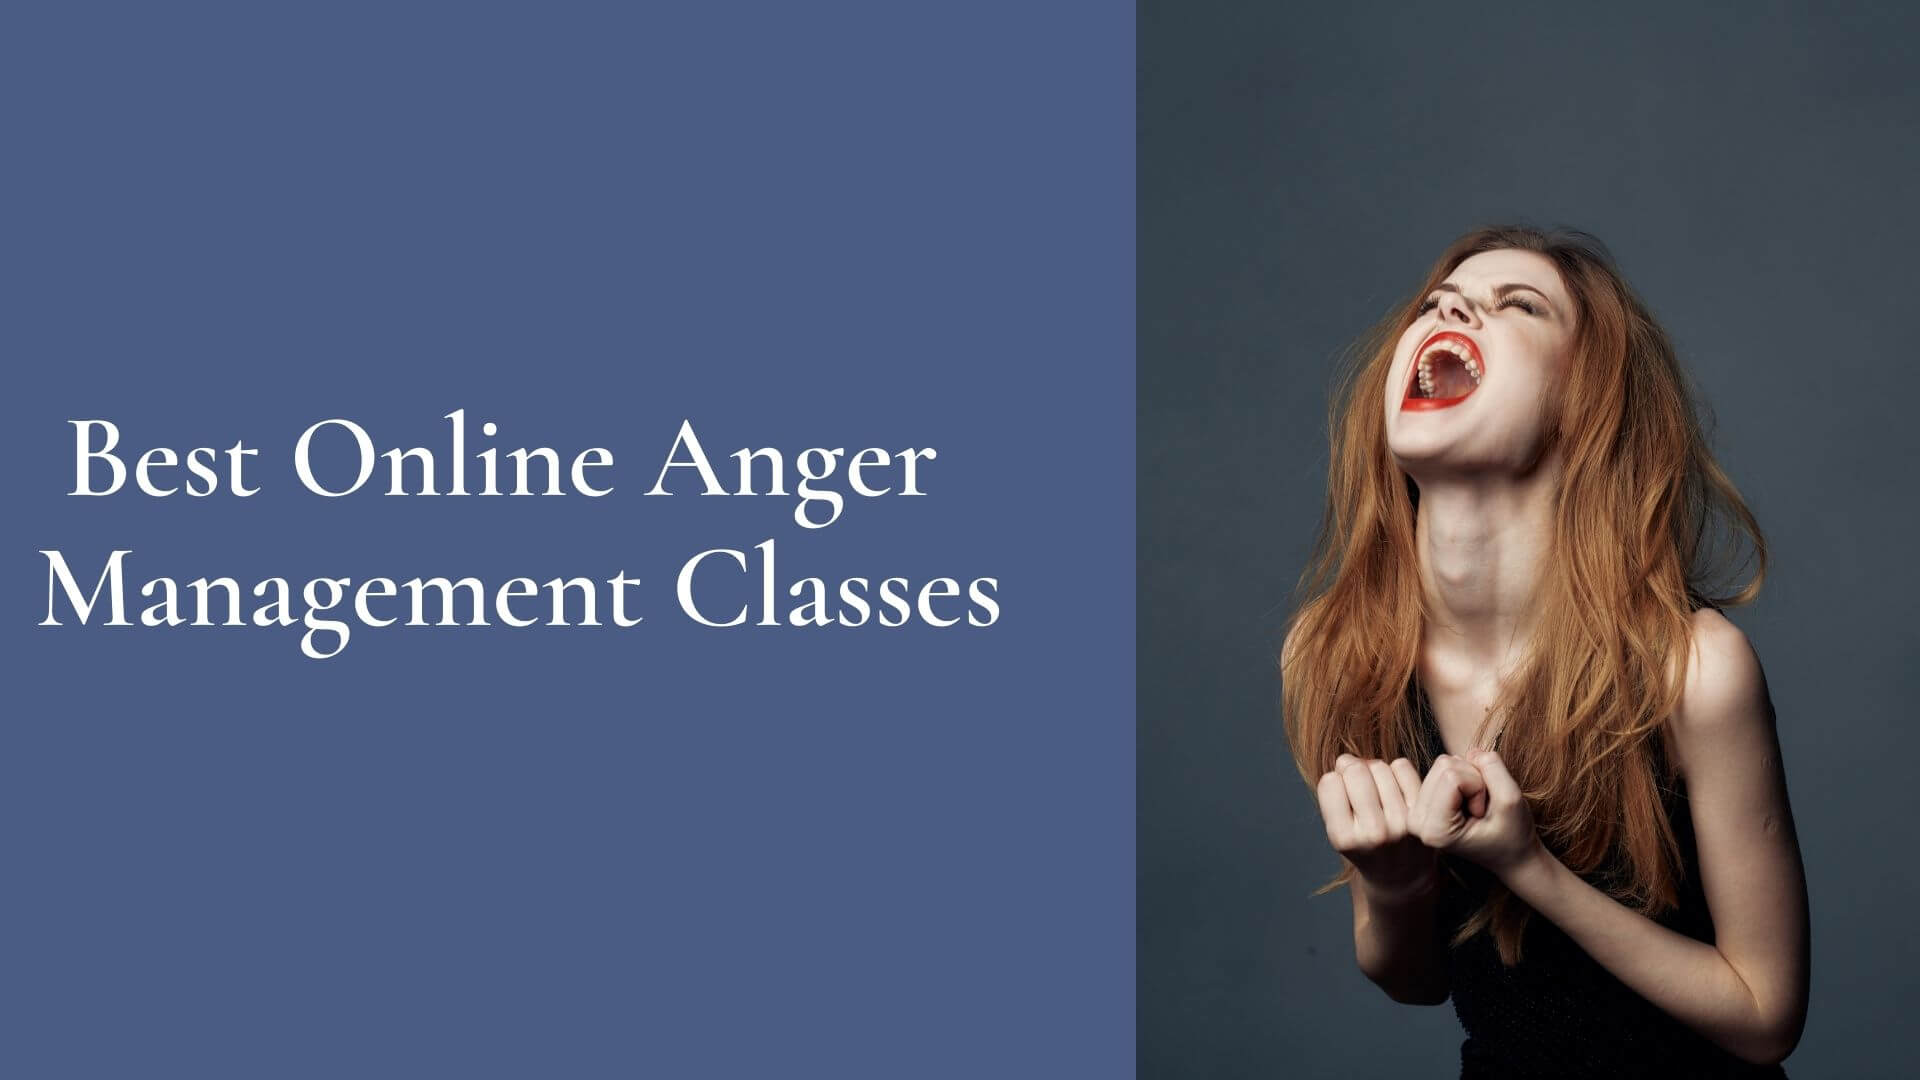 Best Online Anger Management Classes